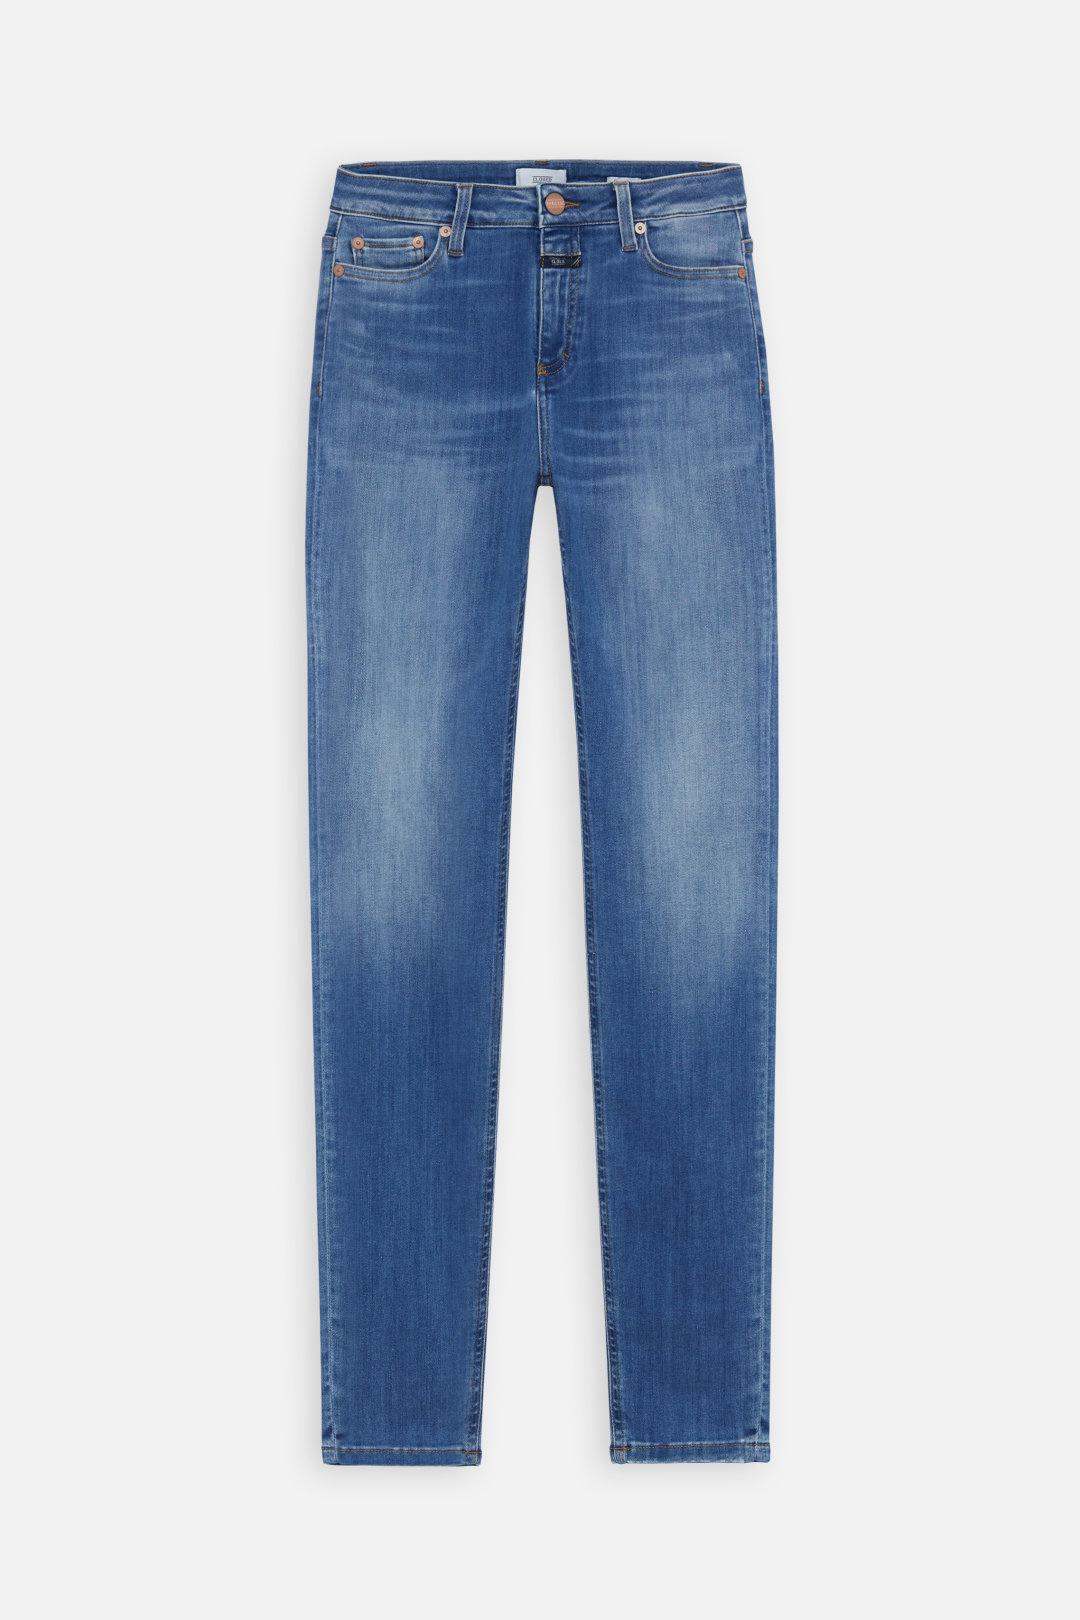 Closed Jeans C91099 08K 39-2